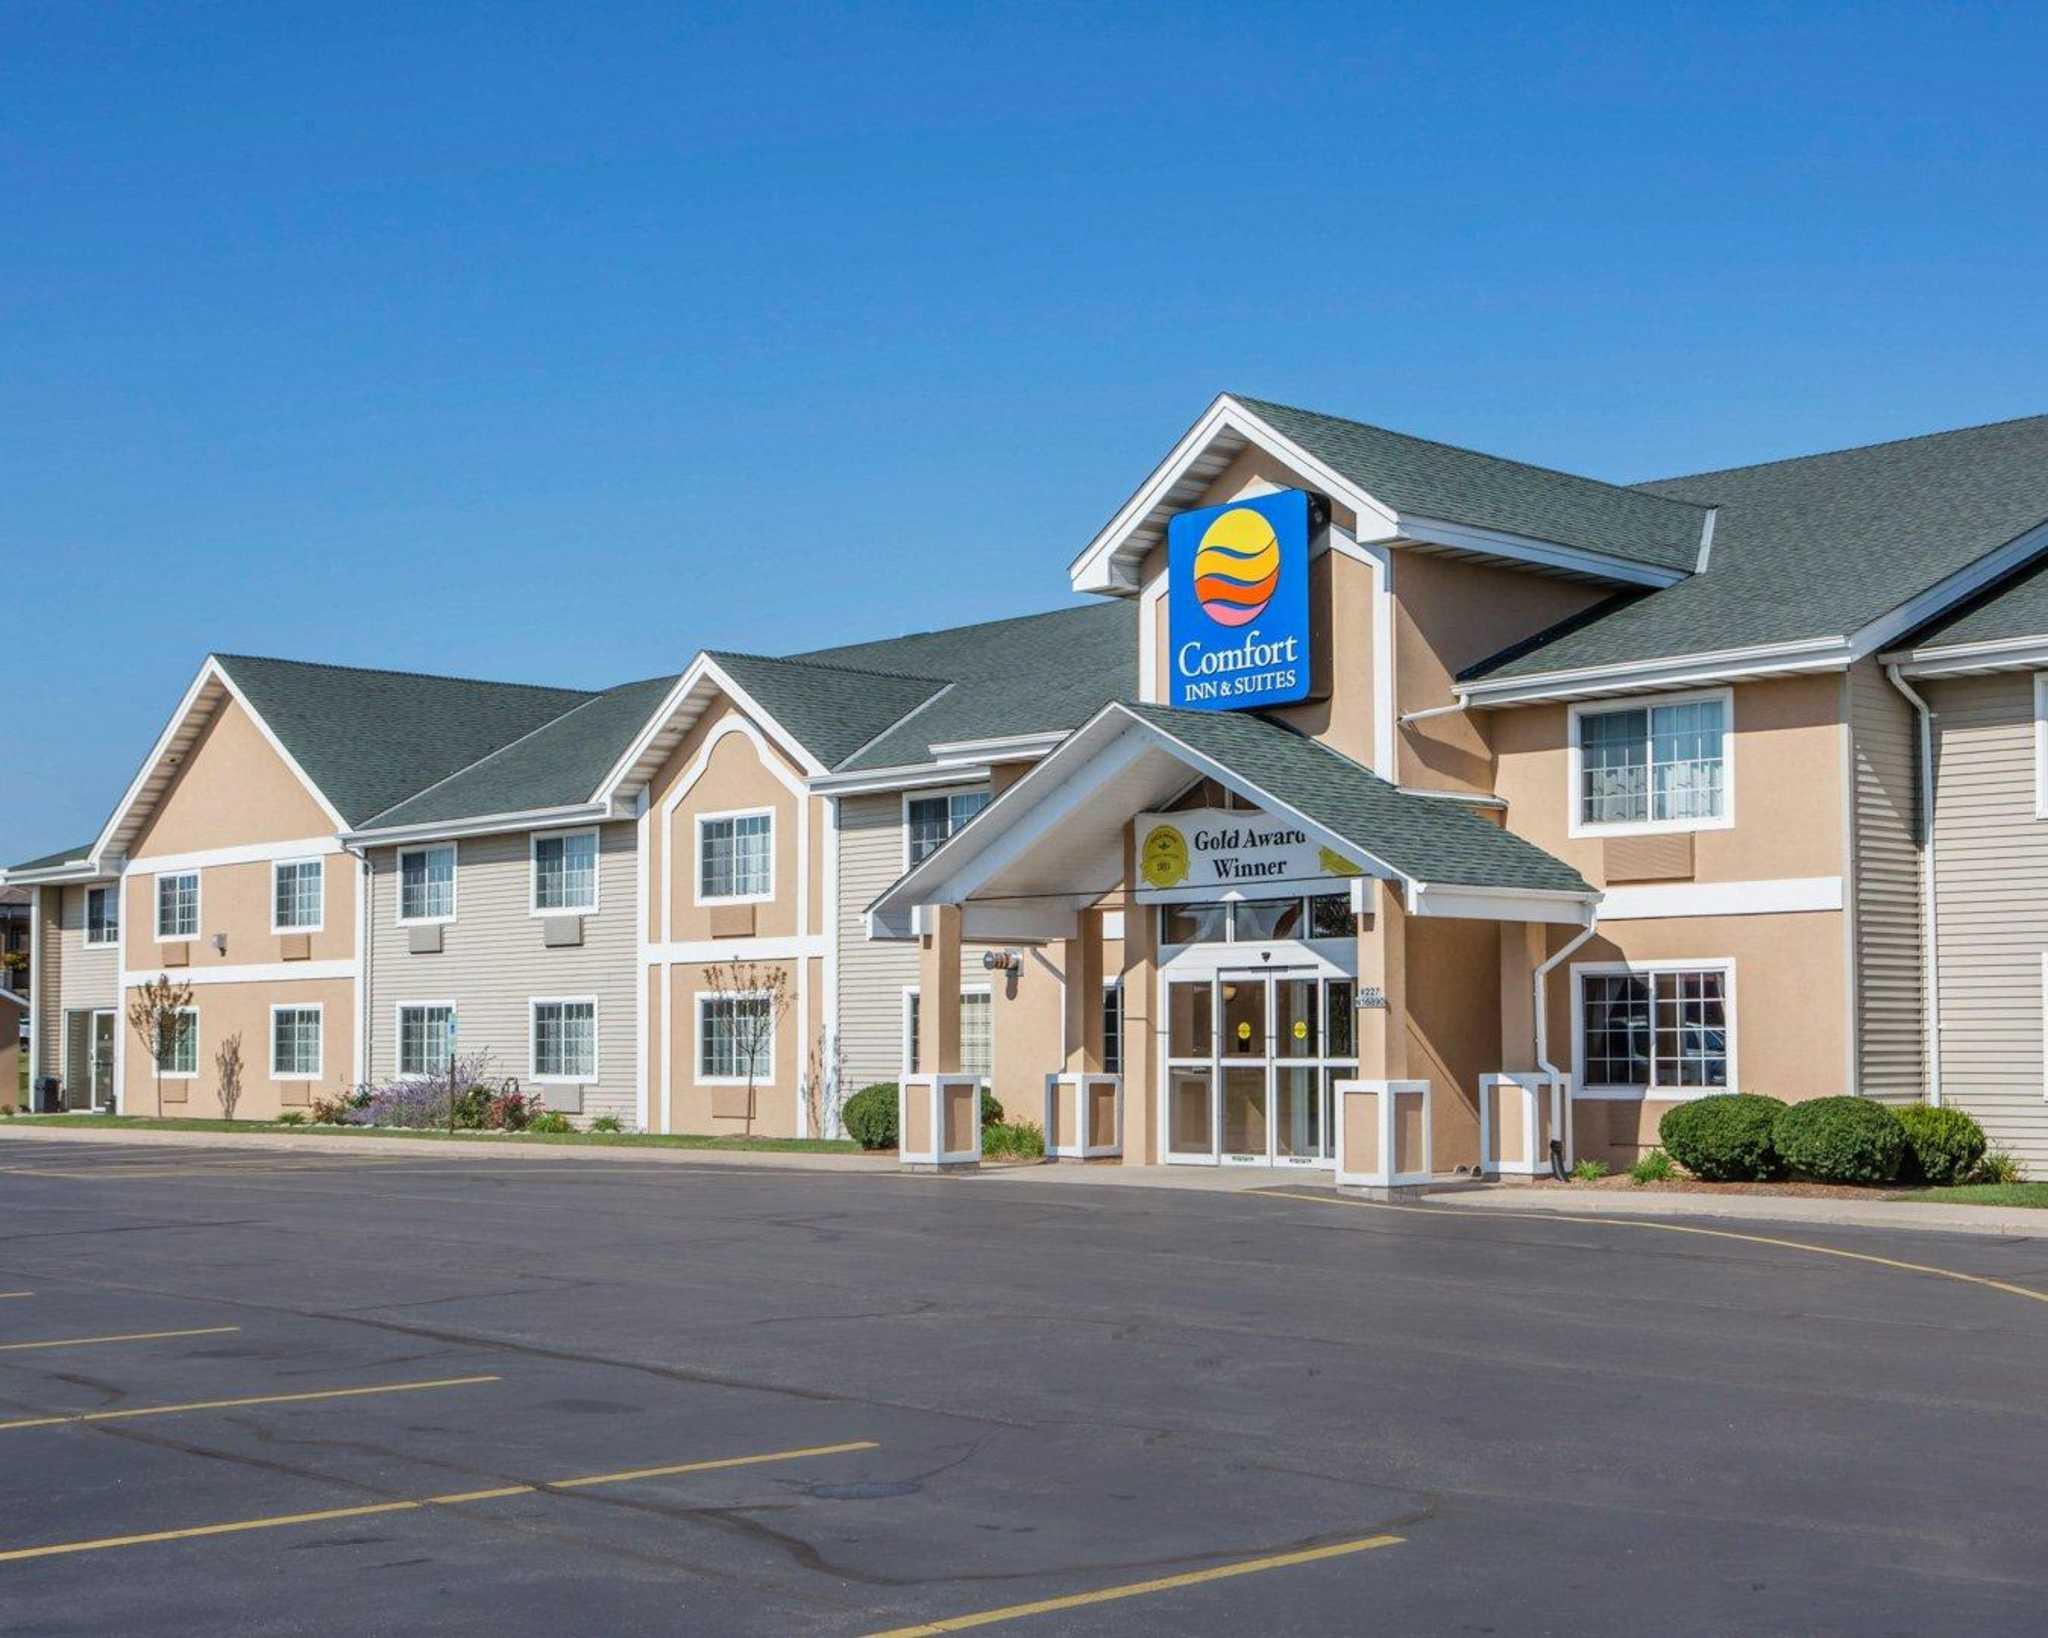 Comfort Inn & Suites Jackson - West Bend image 2